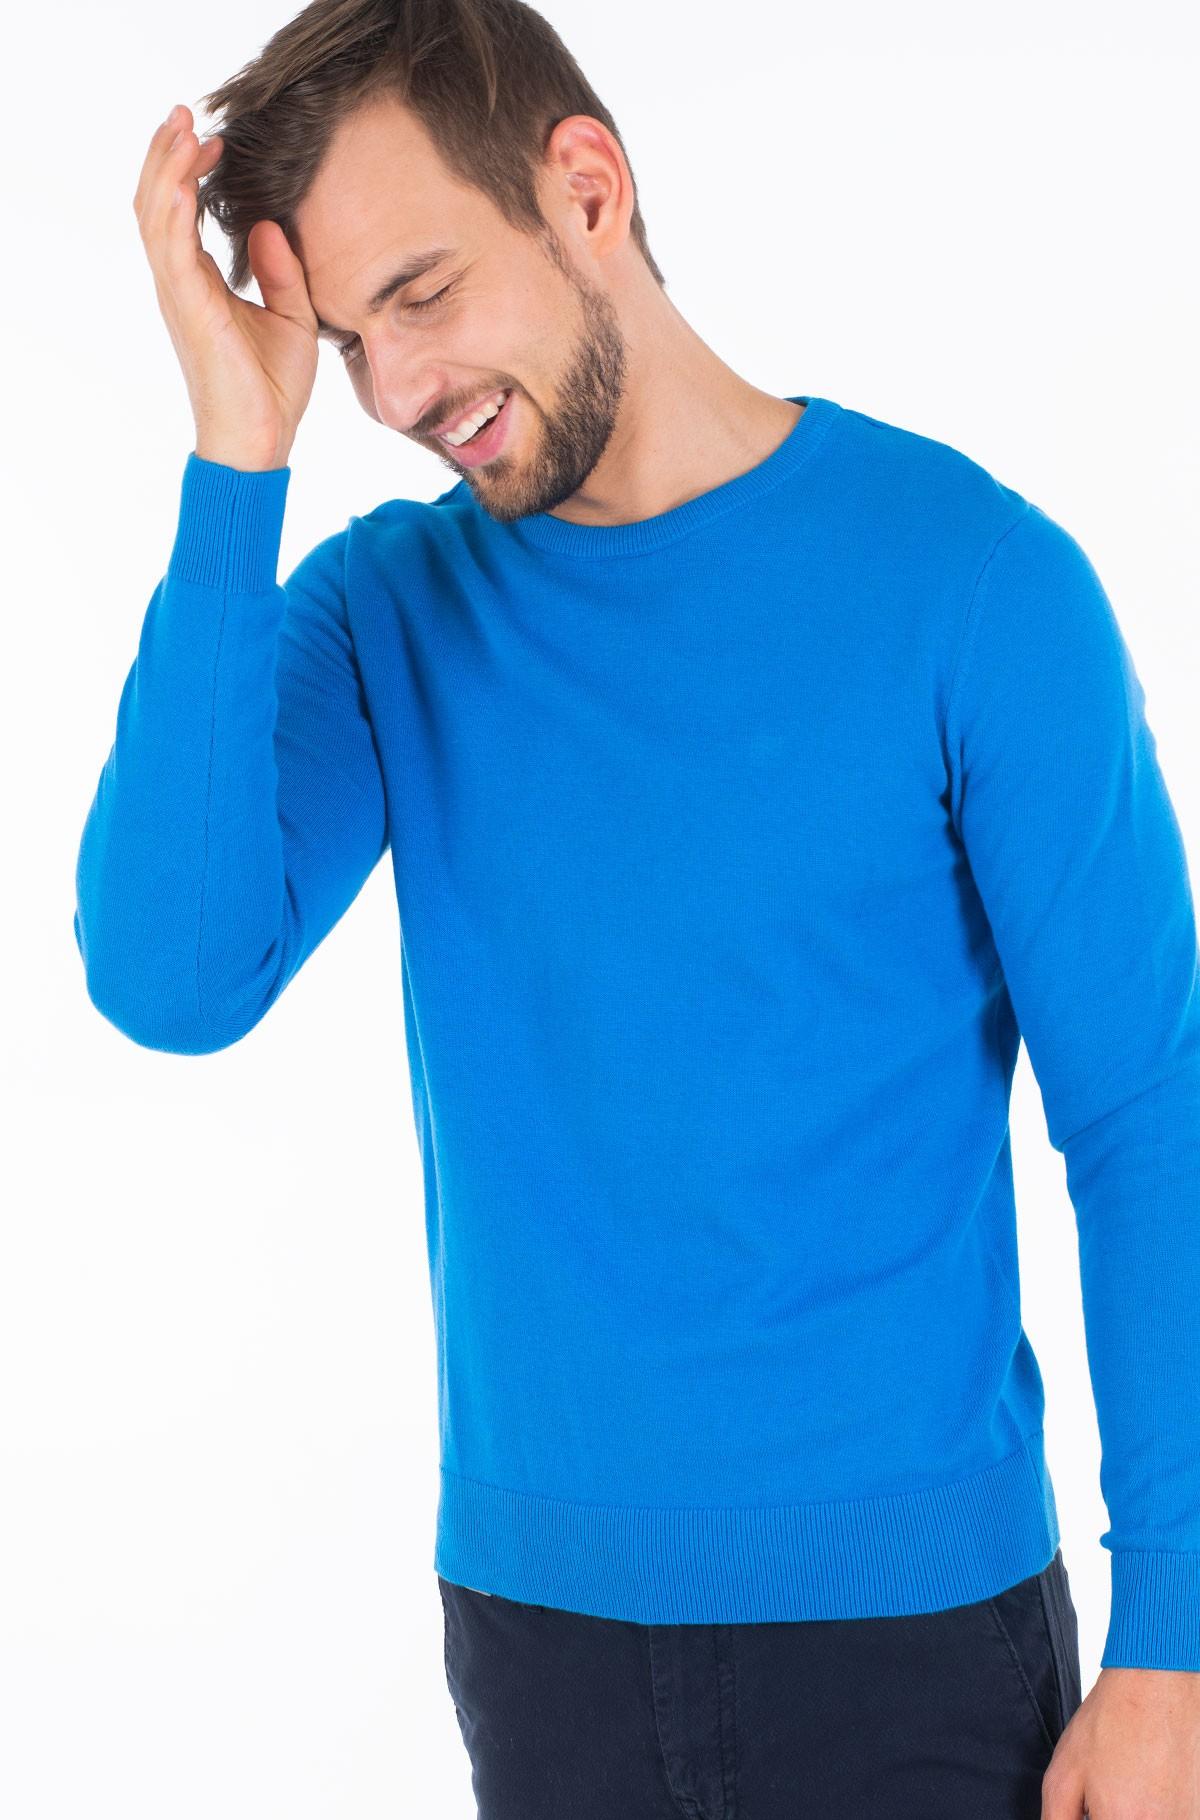 Sweater 1018708-full-1